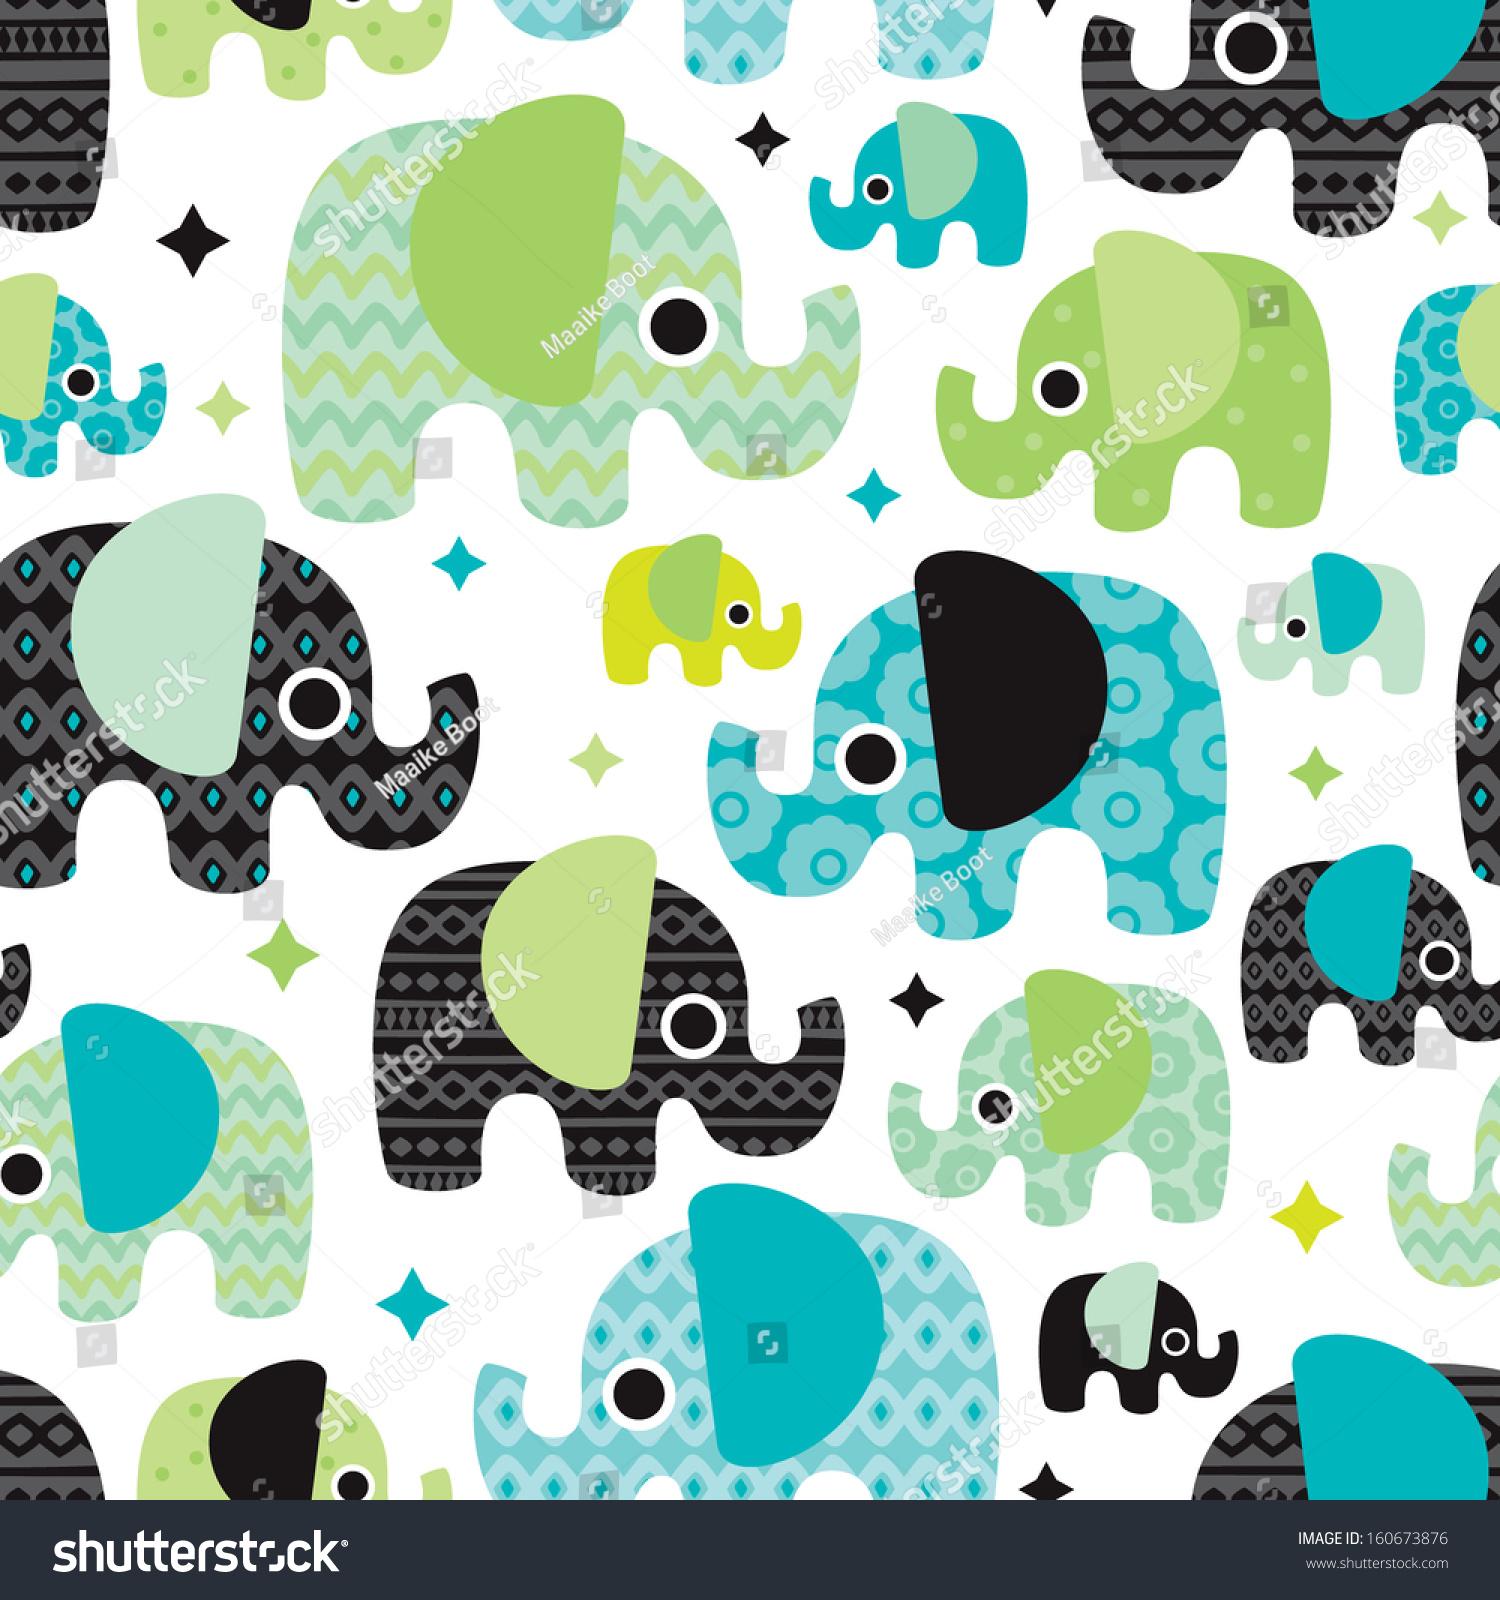 Baby Wallpaper Patterns 42060